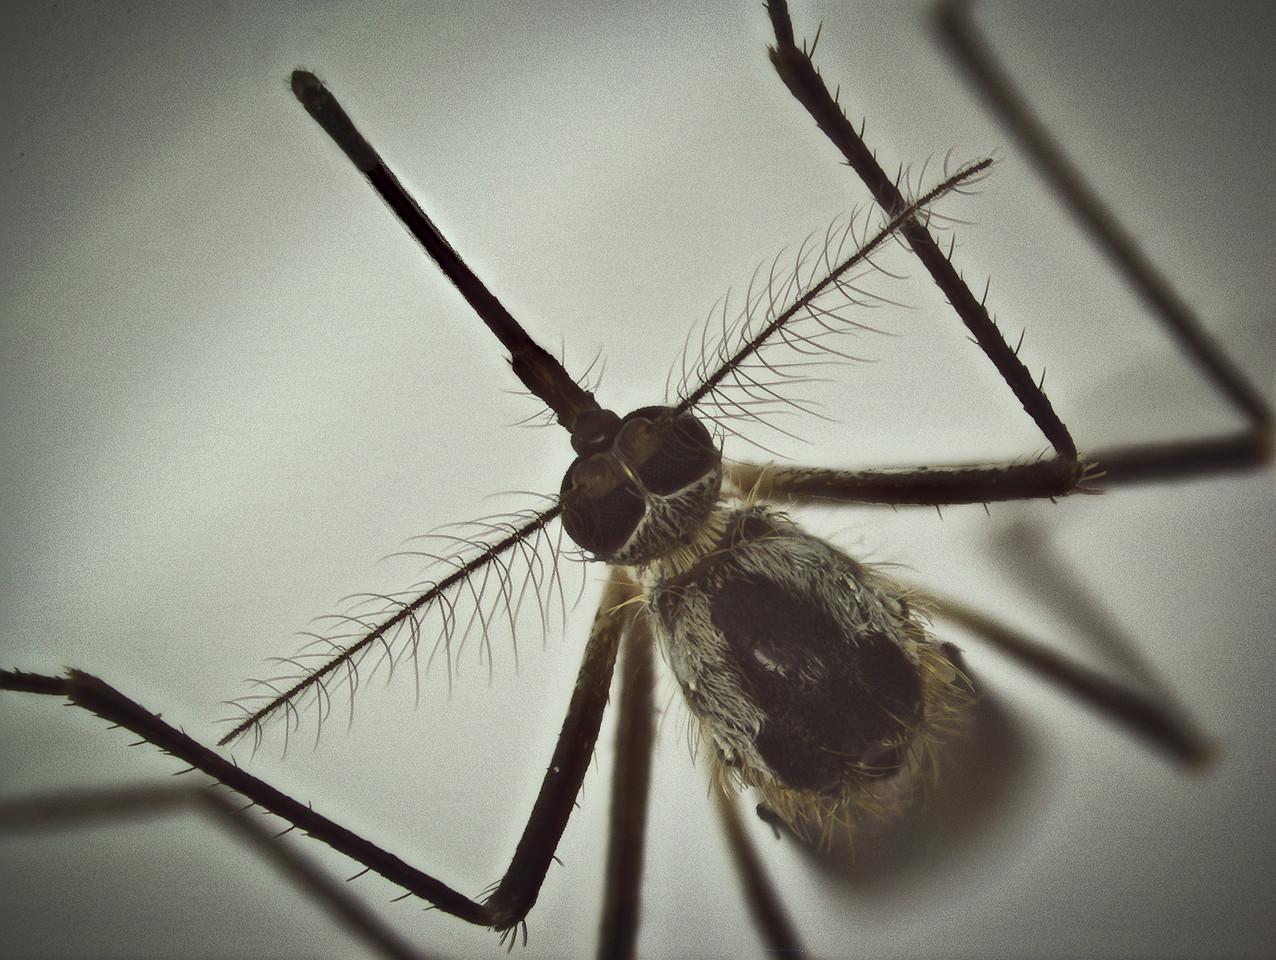 Female mosquito caught feeding on my leg